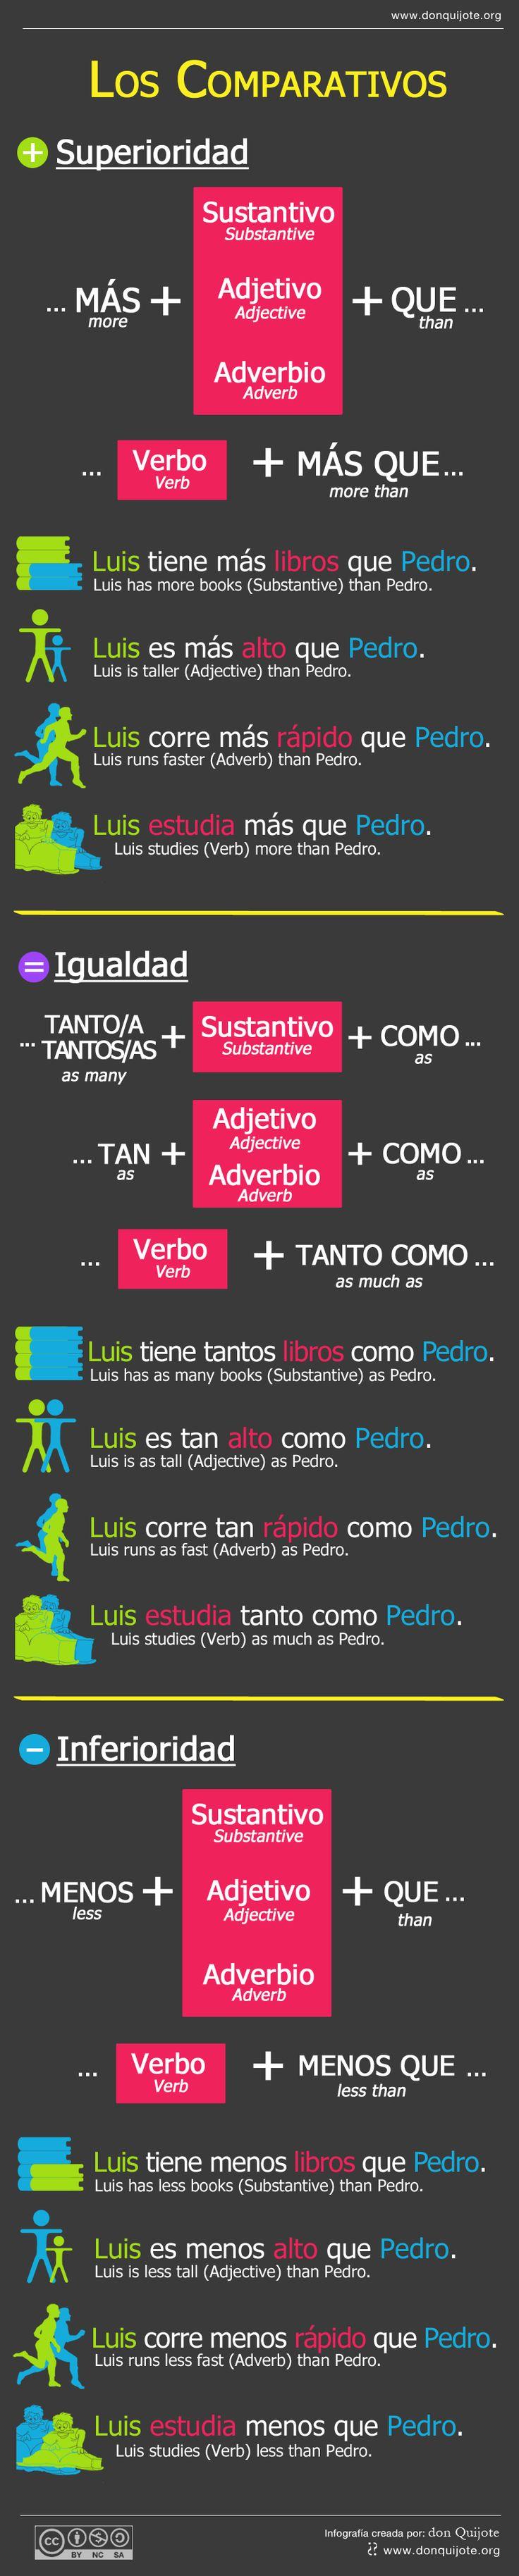 Comparativos en español. http://www.donquijote.org